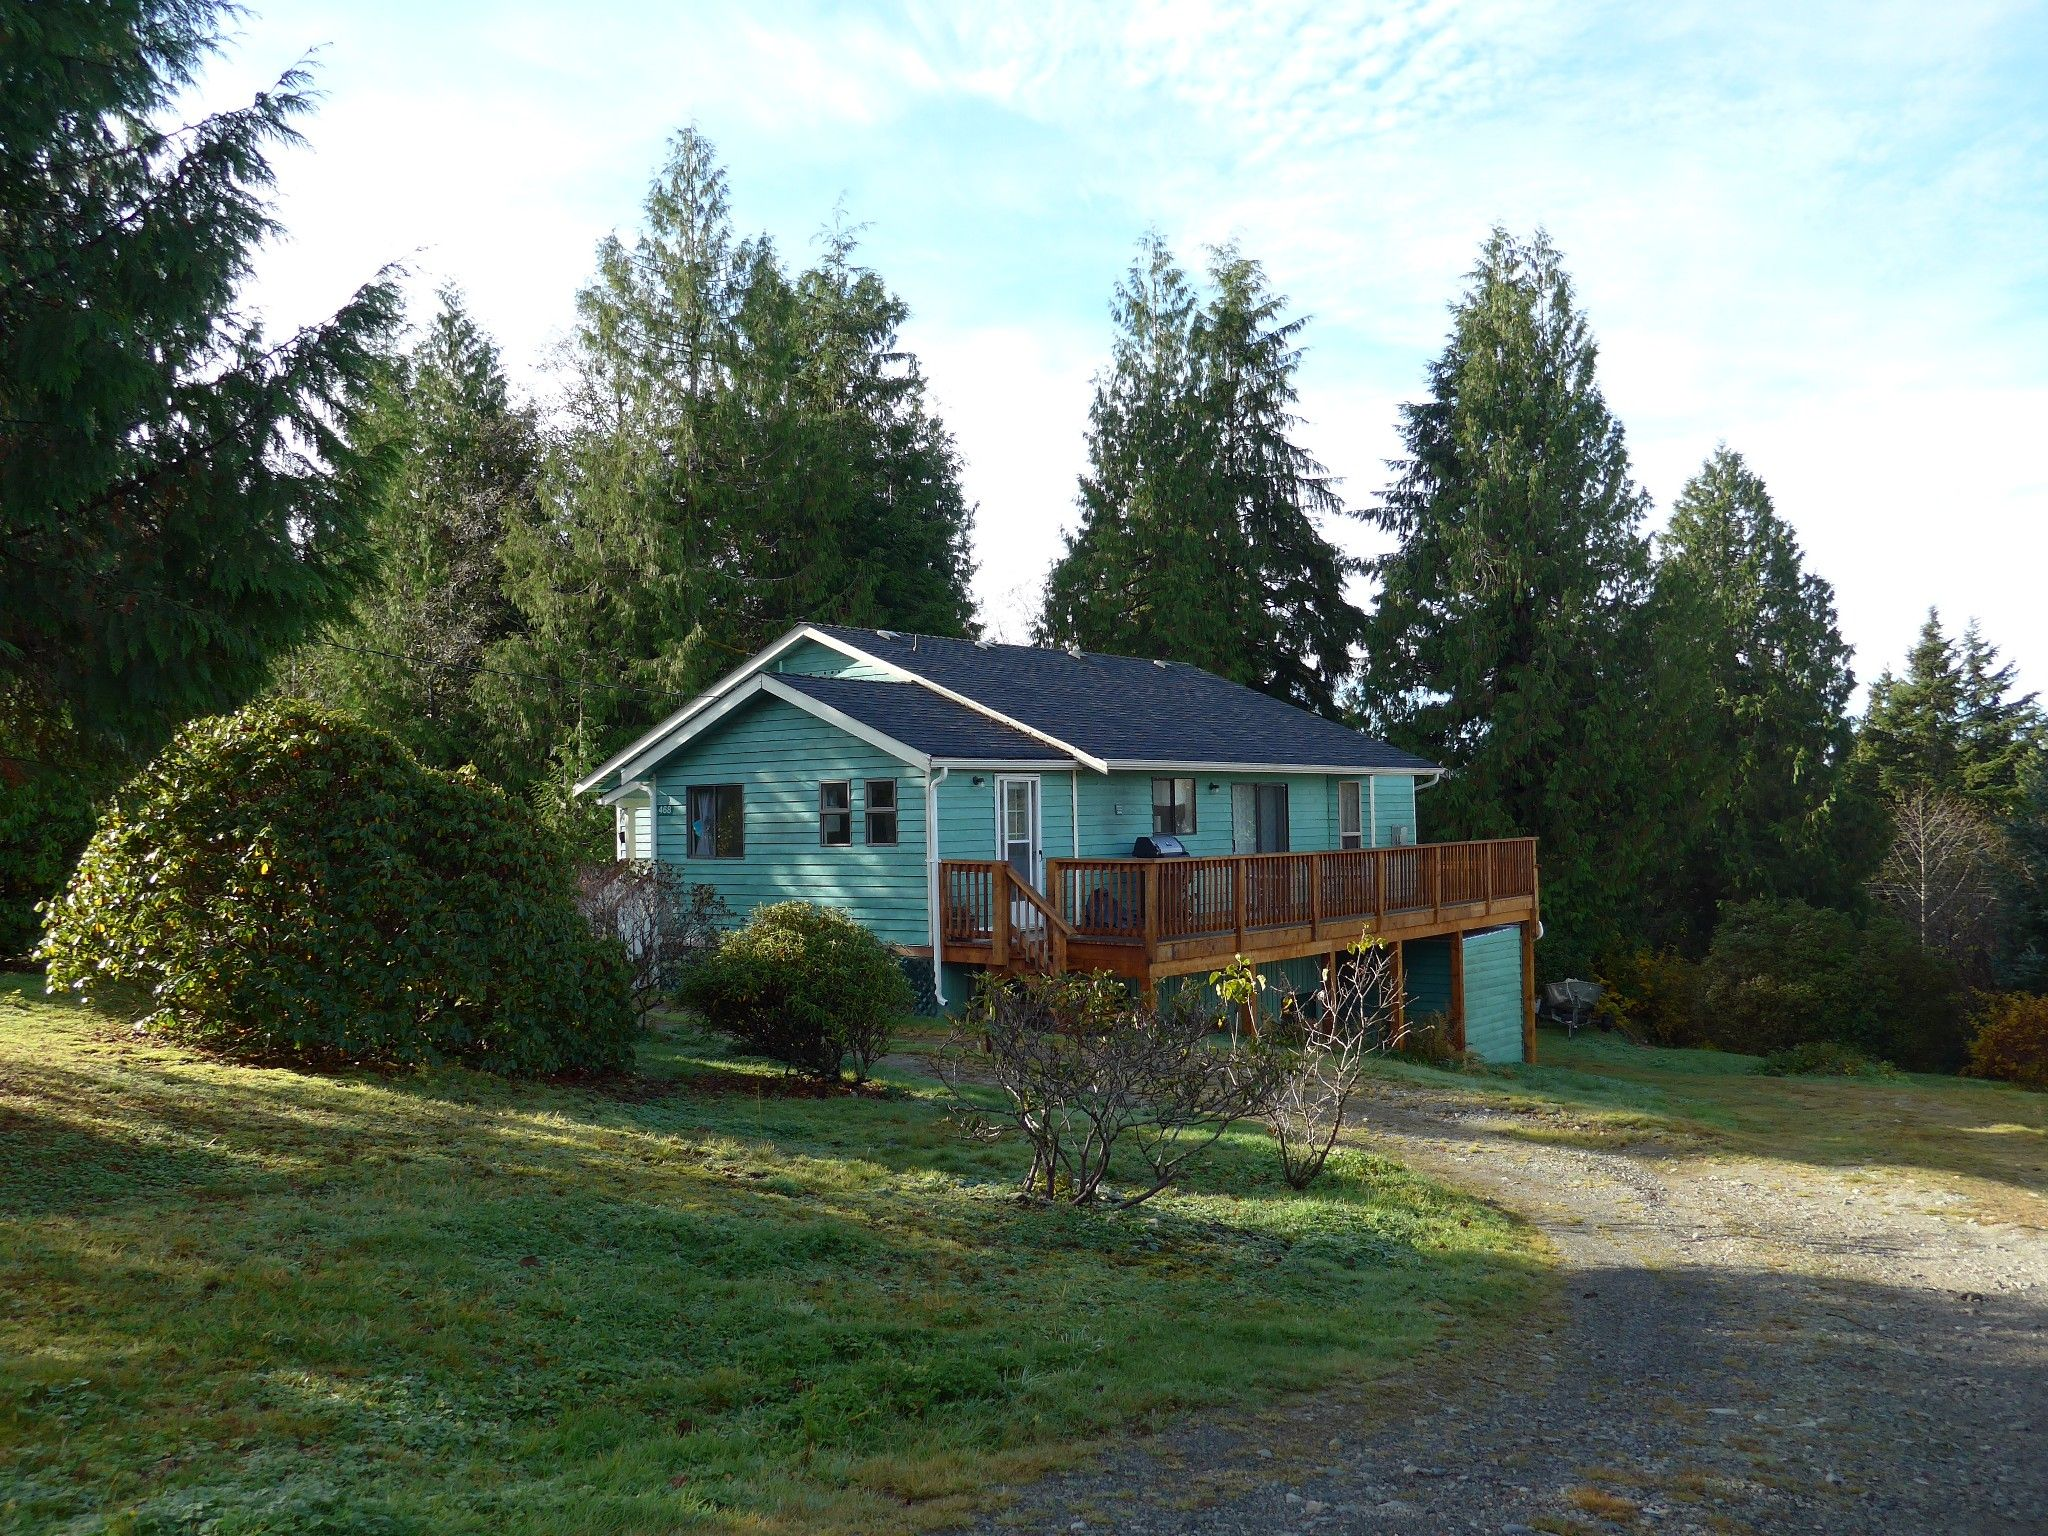 Main Photo: 468 Pachena Road in Bamfield: House for sale : MLS®# 463384